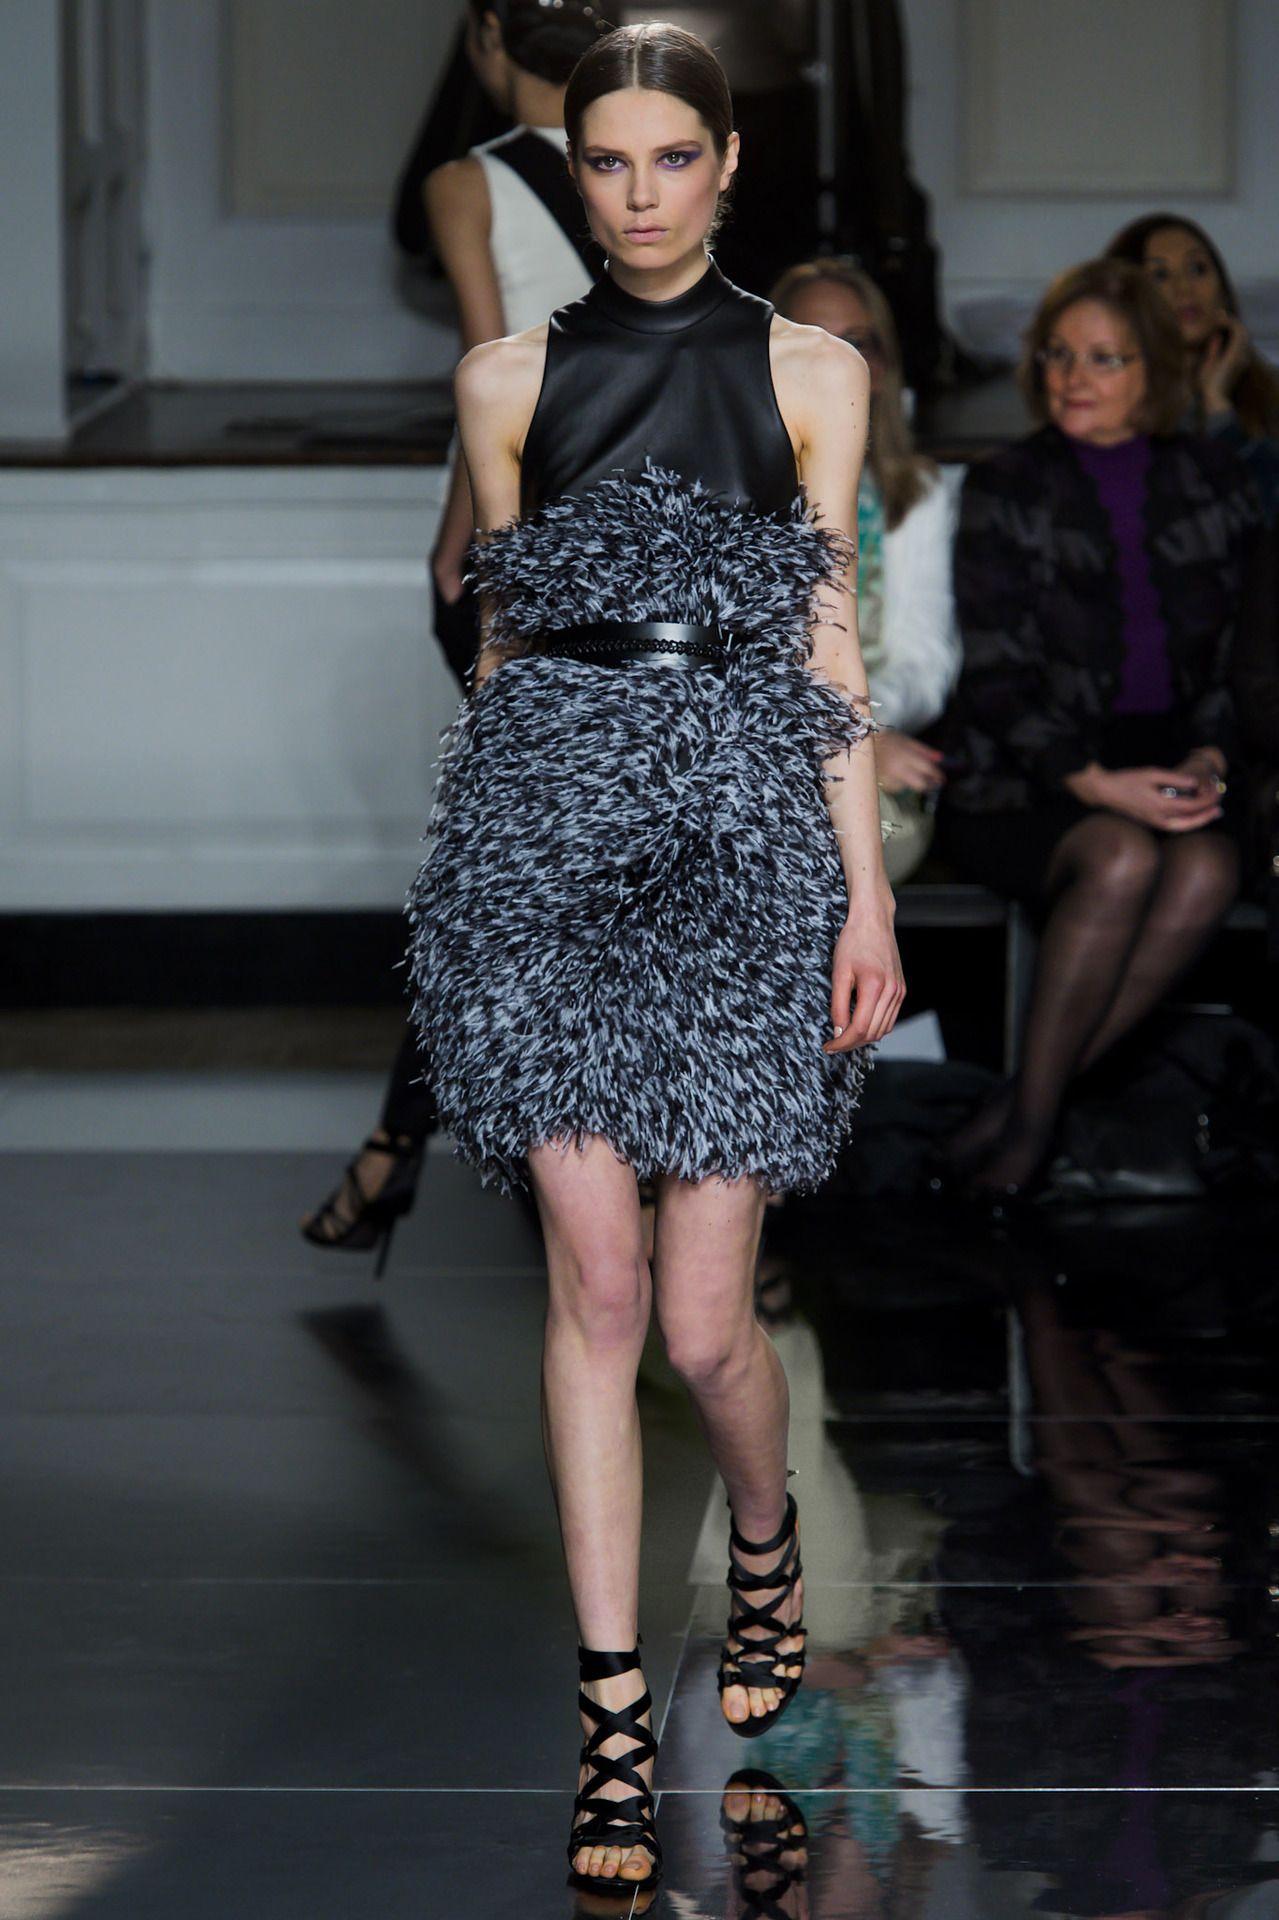 Jason Wu Fall/Winter 2013 – New York fashion week